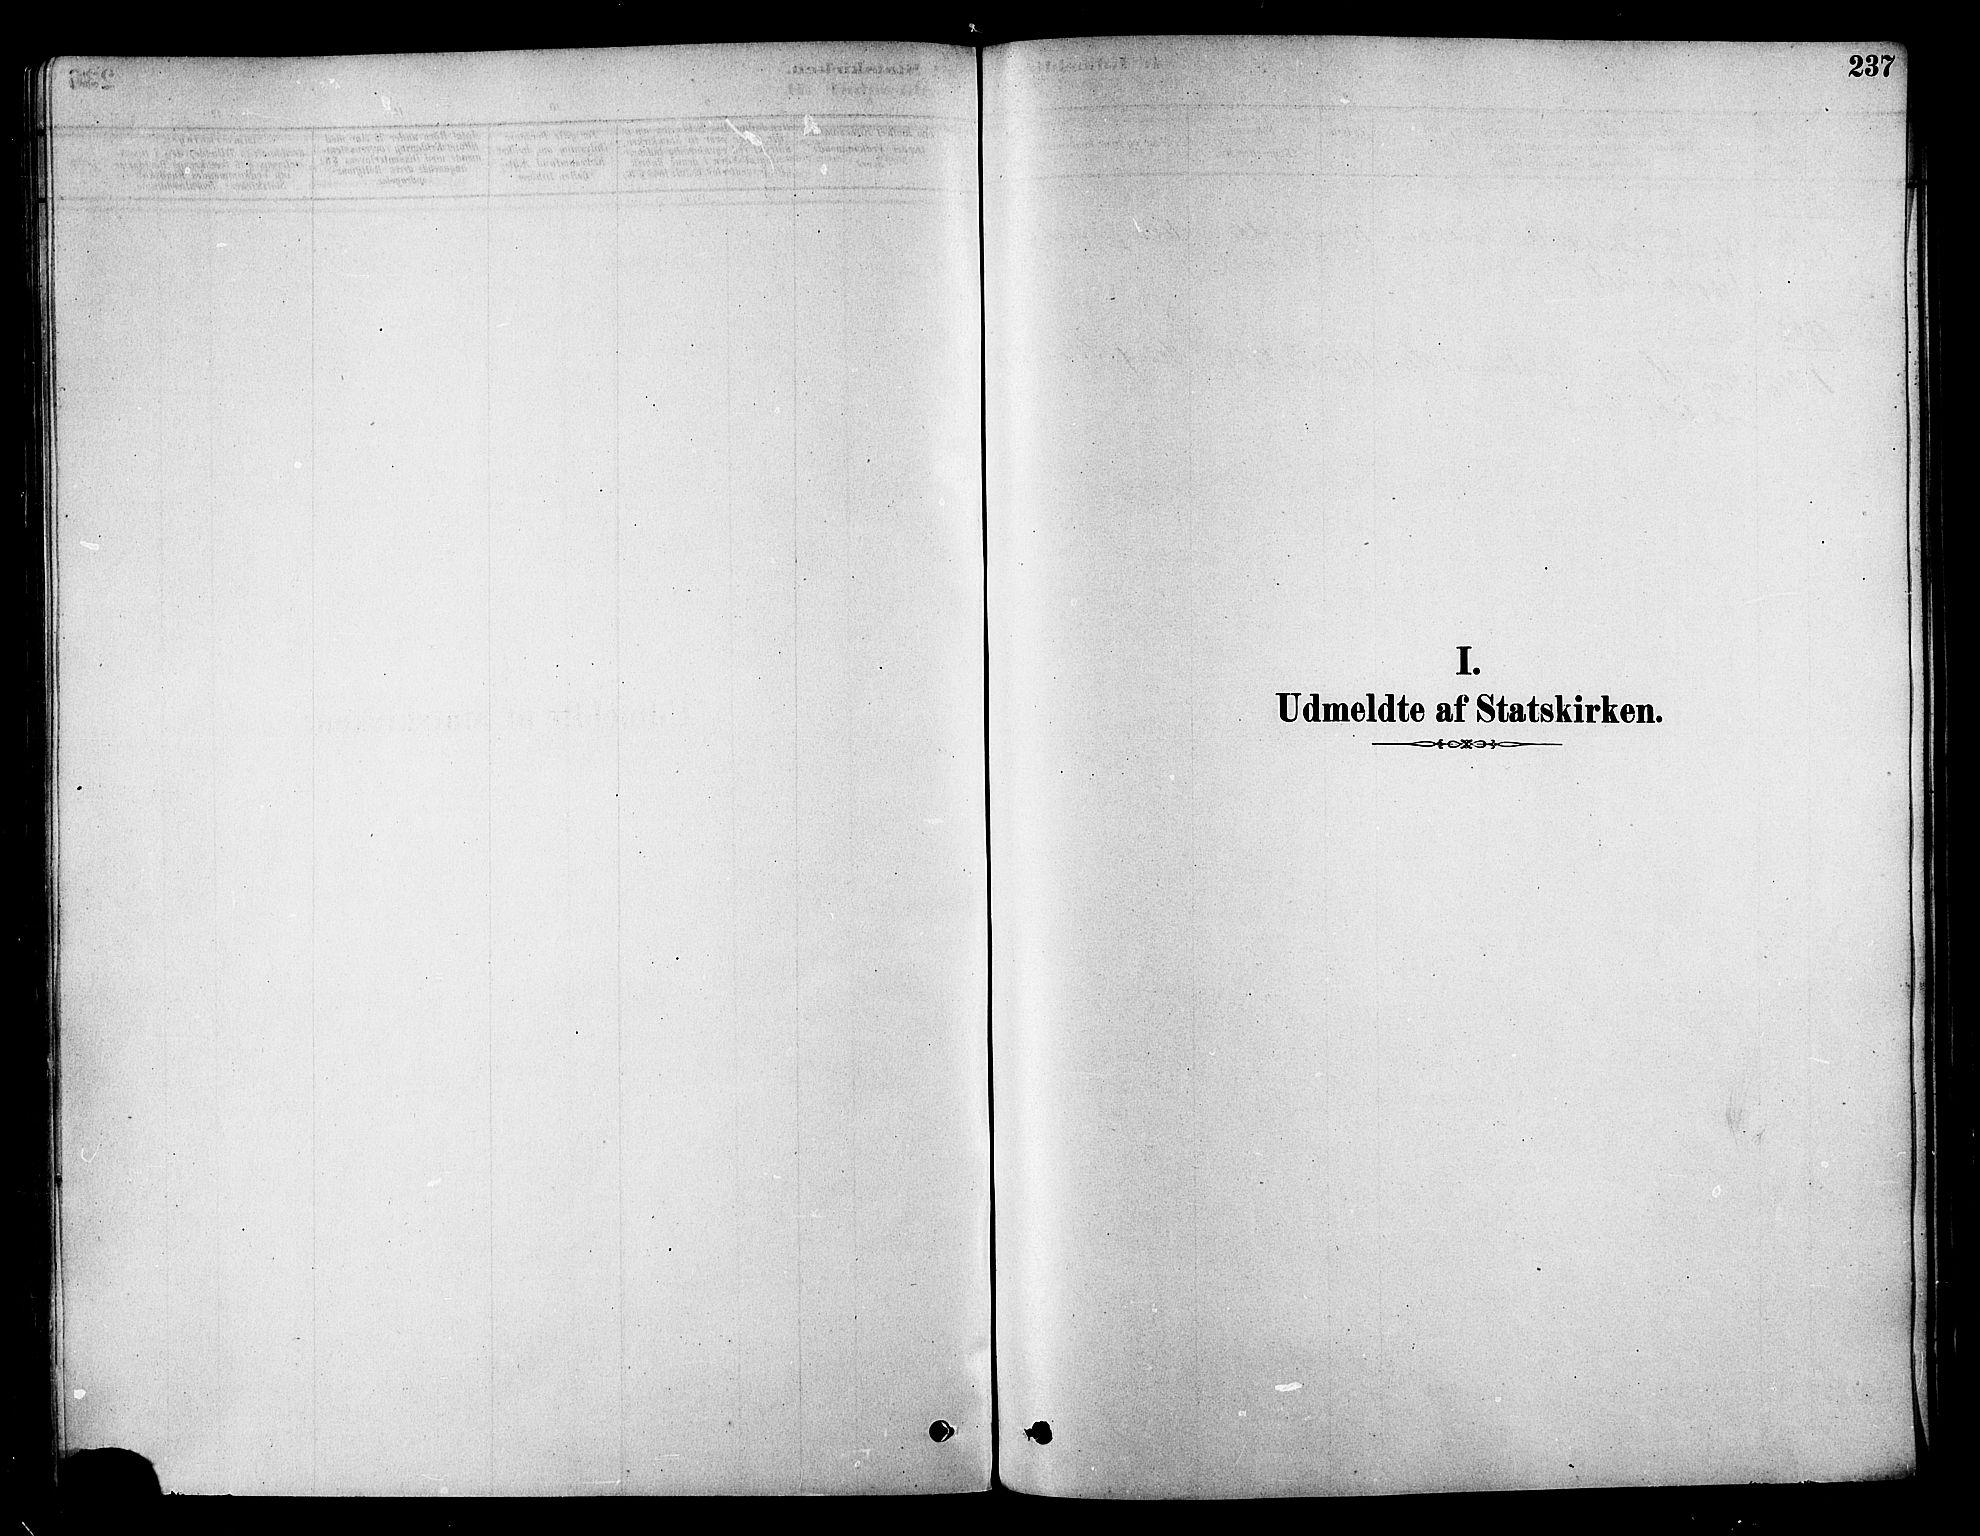 SATØ, Skjervøy sokneprestkontor, H/Ha/Haa/L0009kirke: Ministerialbok nr. 9, 1878-1887, s. 237